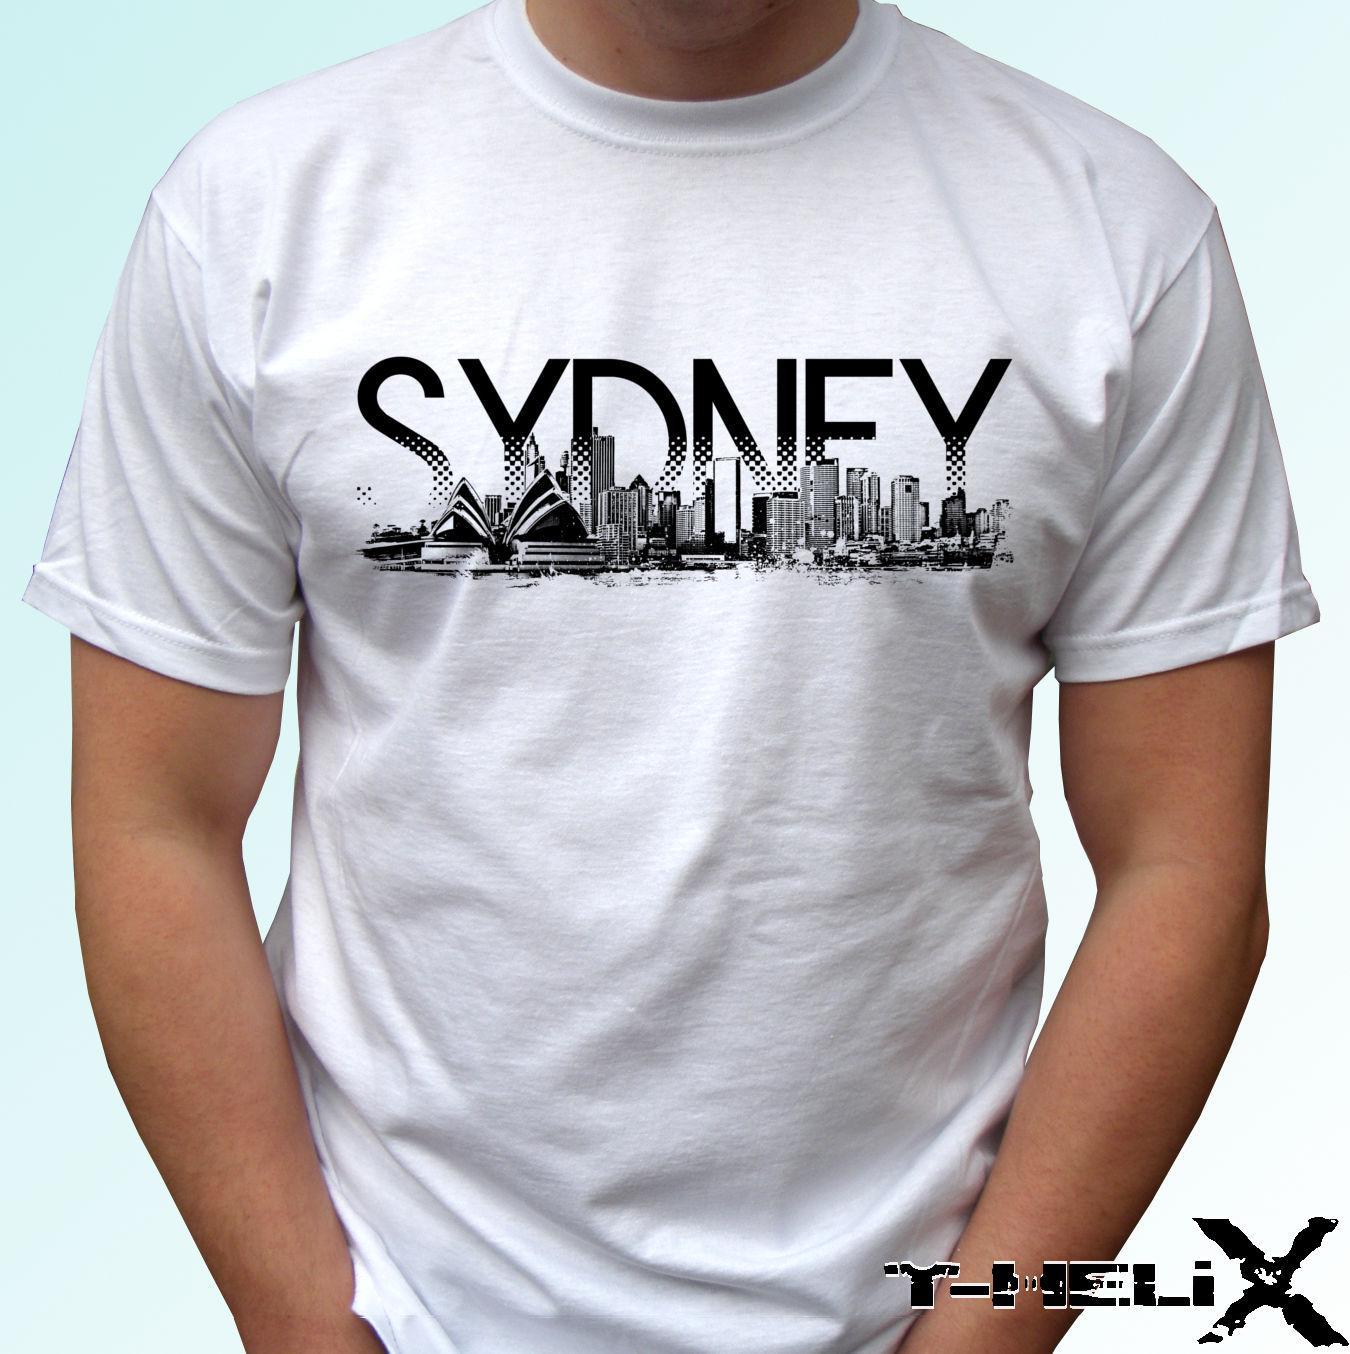 Sydney City T Shirt Top Australia Tee Design Mens Womens Kids Baby